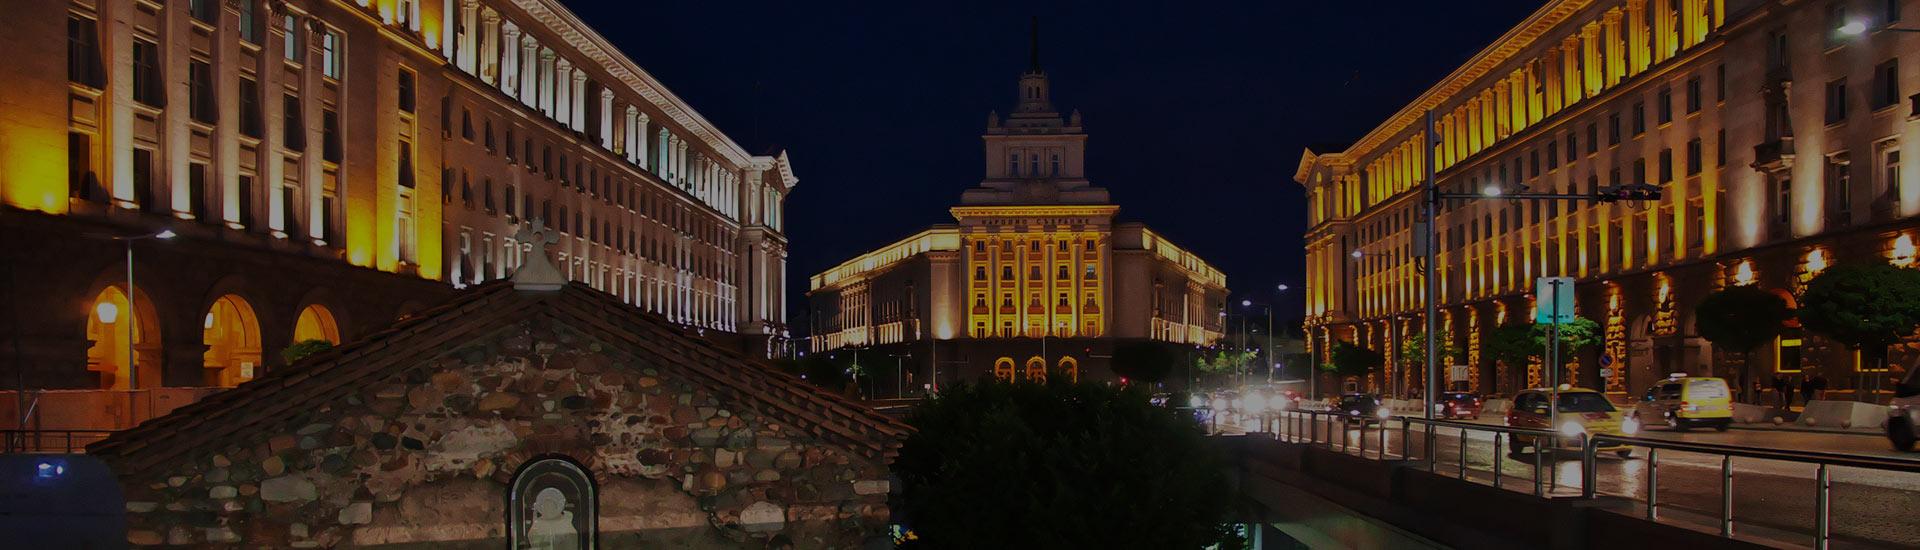 Logistikunternehmen Bulgarien Sofia